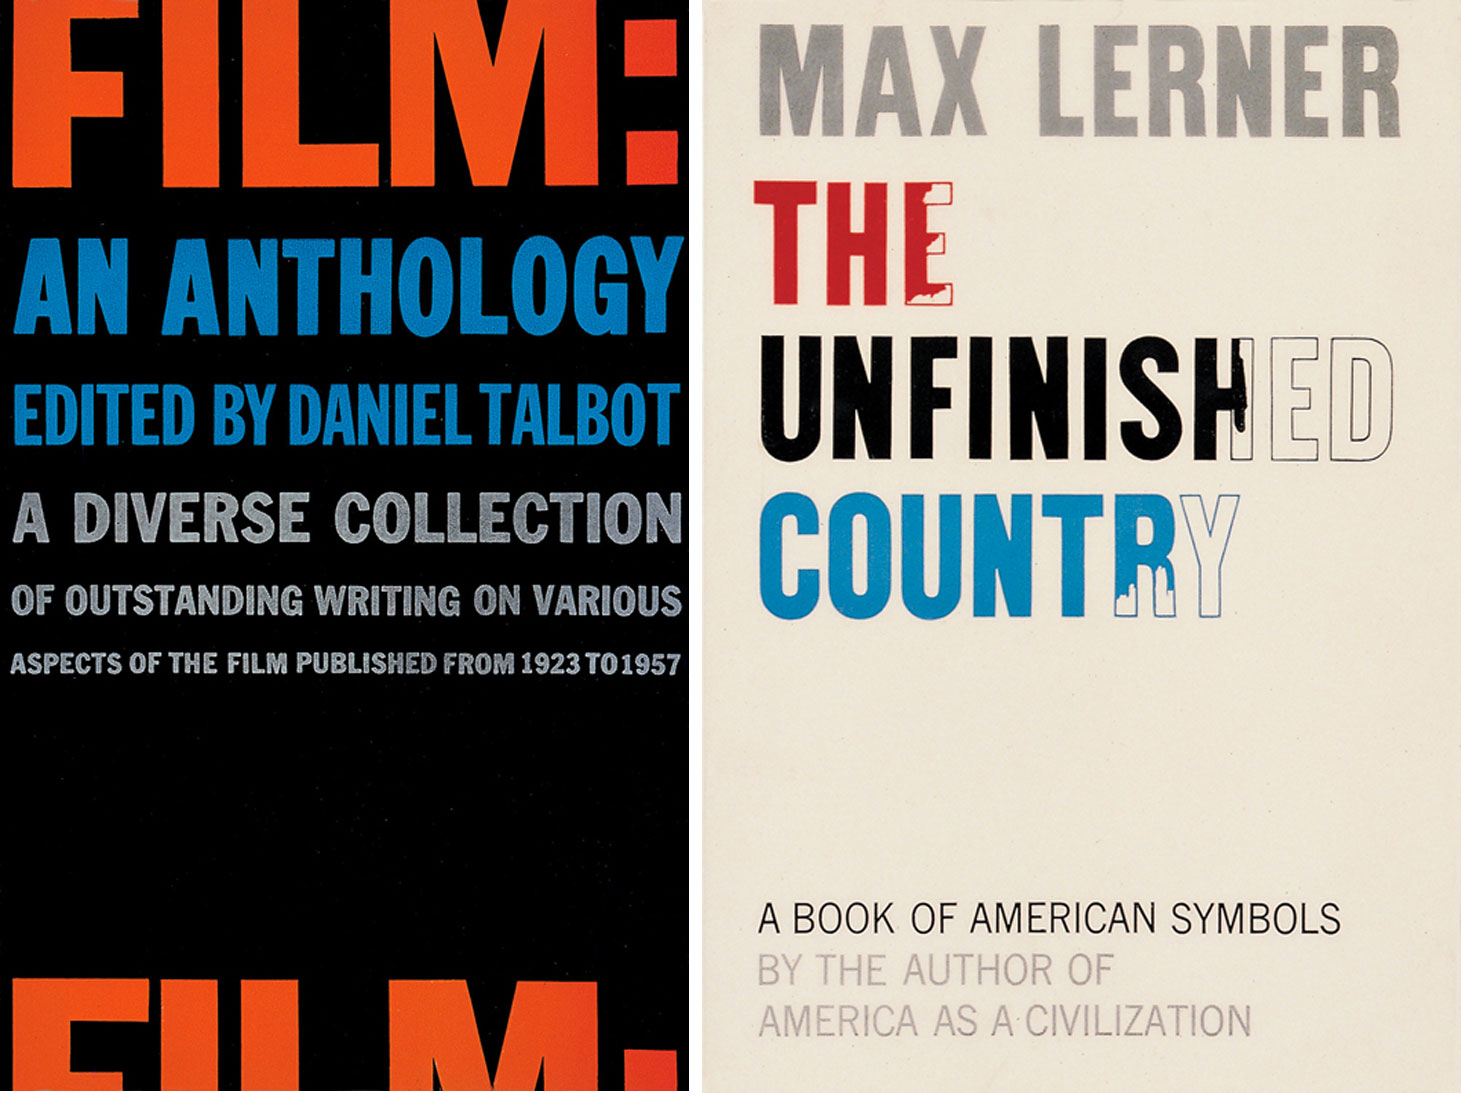 Chermayeff-and-Geismar-books-covers-01